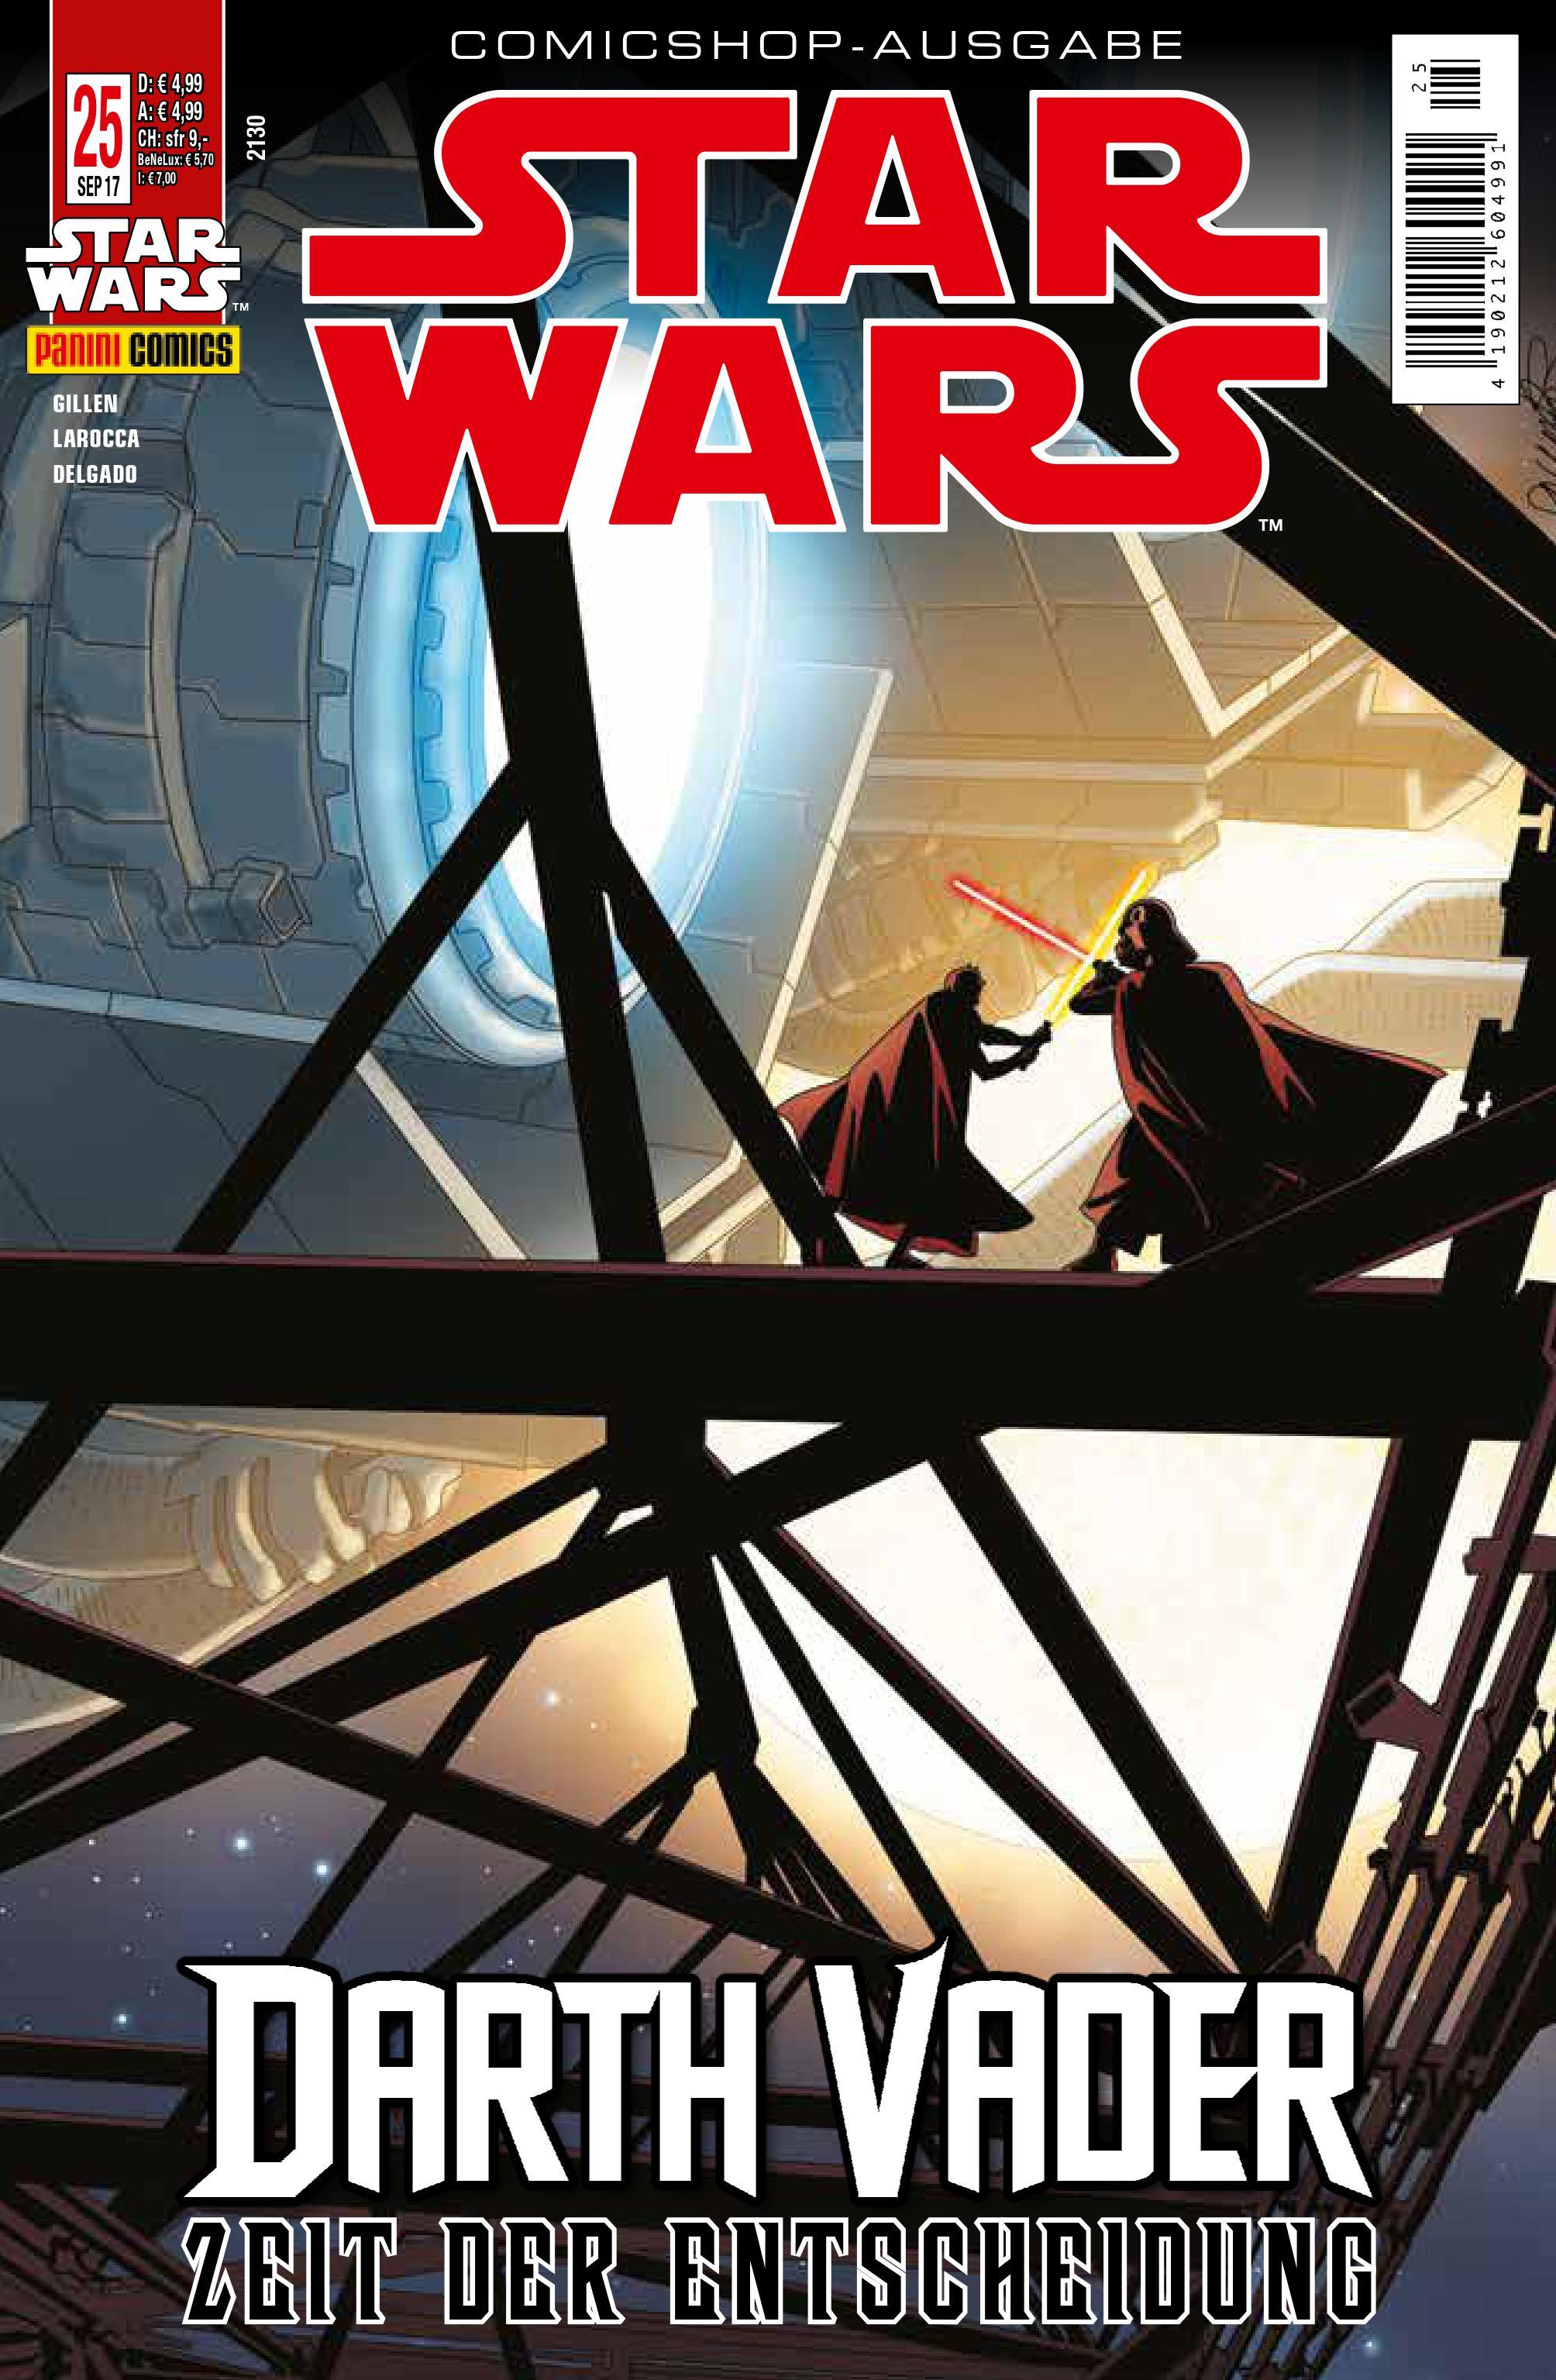 Star Wars #25 (Comicshop-Ausgabe) (23.08.2017)